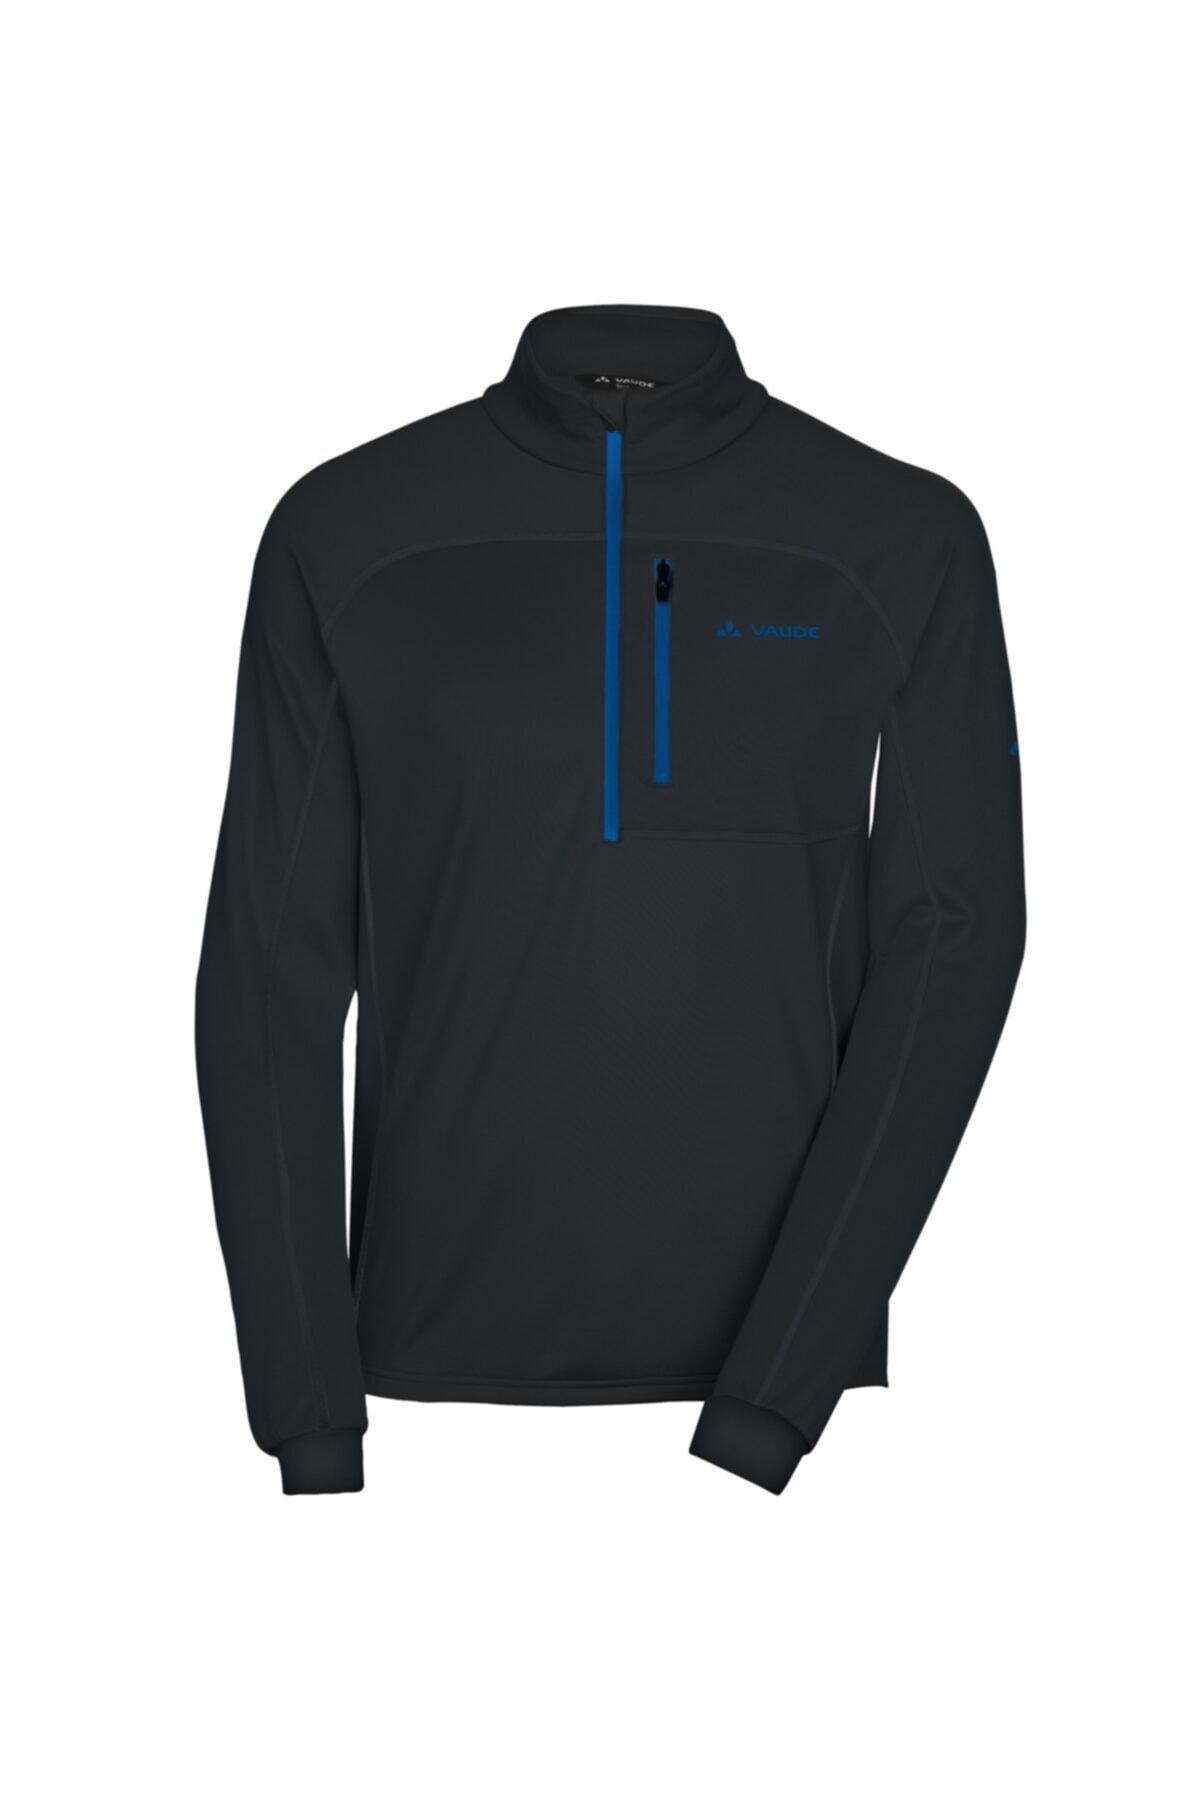 VAUDE Boe Halfzip Erkek Termal T-Shirt 05250 1